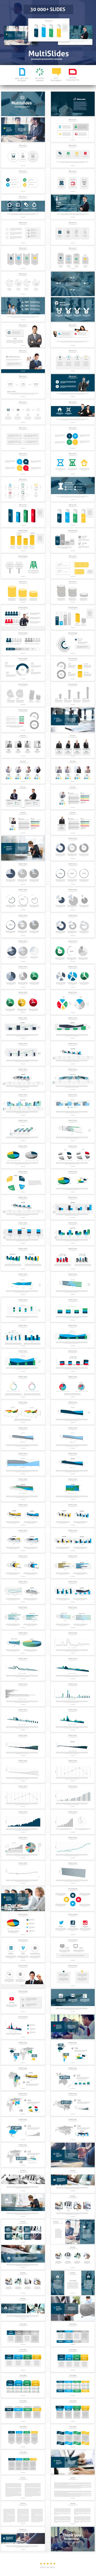 MultiSlides Powerpoint Presentation Template - Business PowerPoint Templates